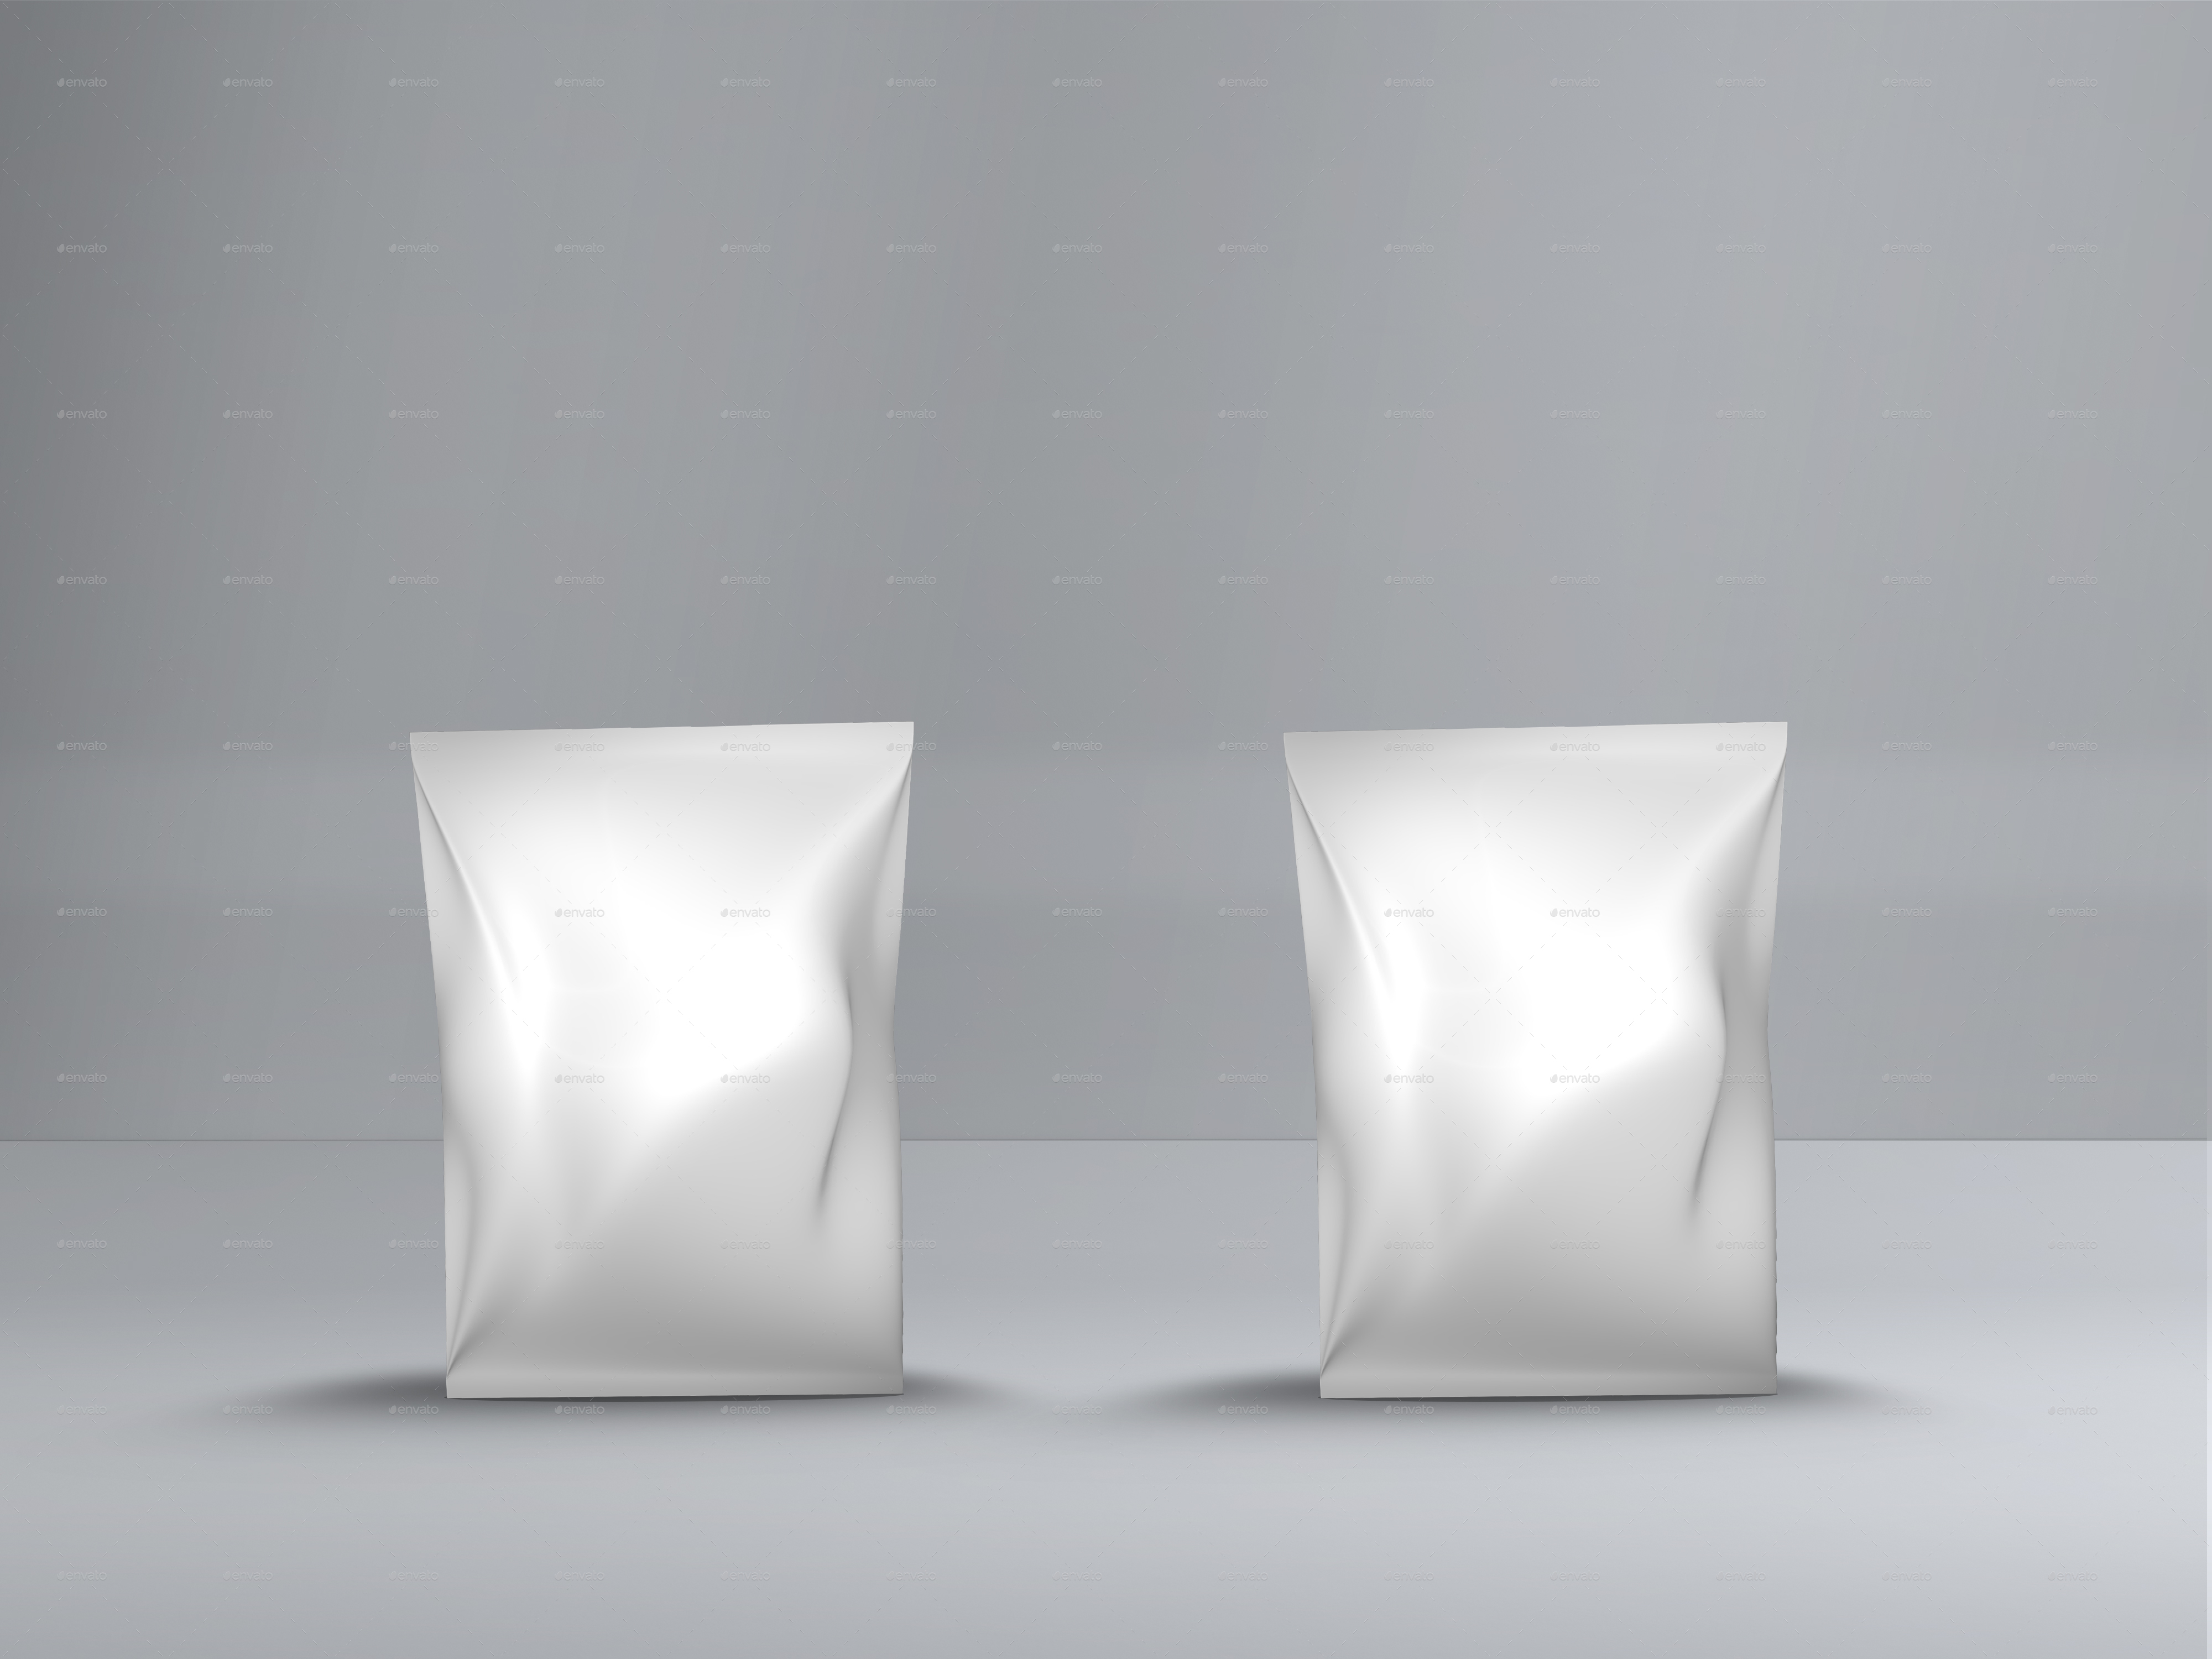 Small Size Potato Chips Bag Mockup By Designsmill